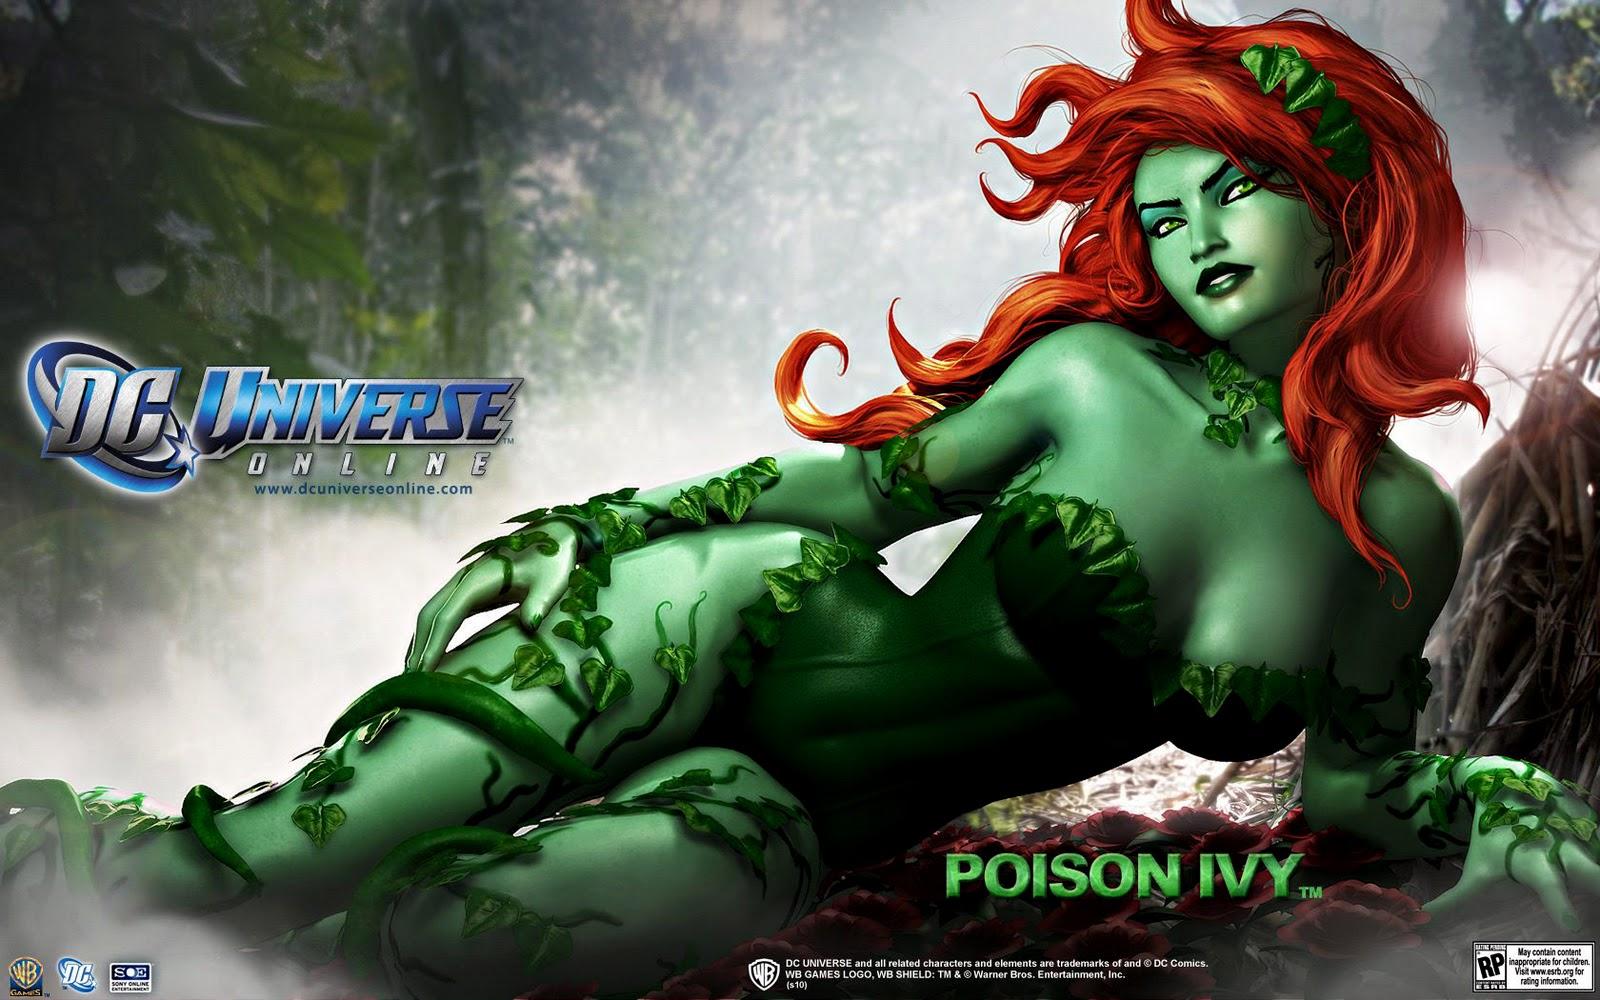 http://2.bp.blogspot.com/-3B3XqcoeQug/TnXjwaQiTUI/AAAAAAAADHI/hsrmebry8rc/s1600/DC_Universe_Online_Poison_Ivy_HD_Wallpaper_Vvallpaper.Net.jpg